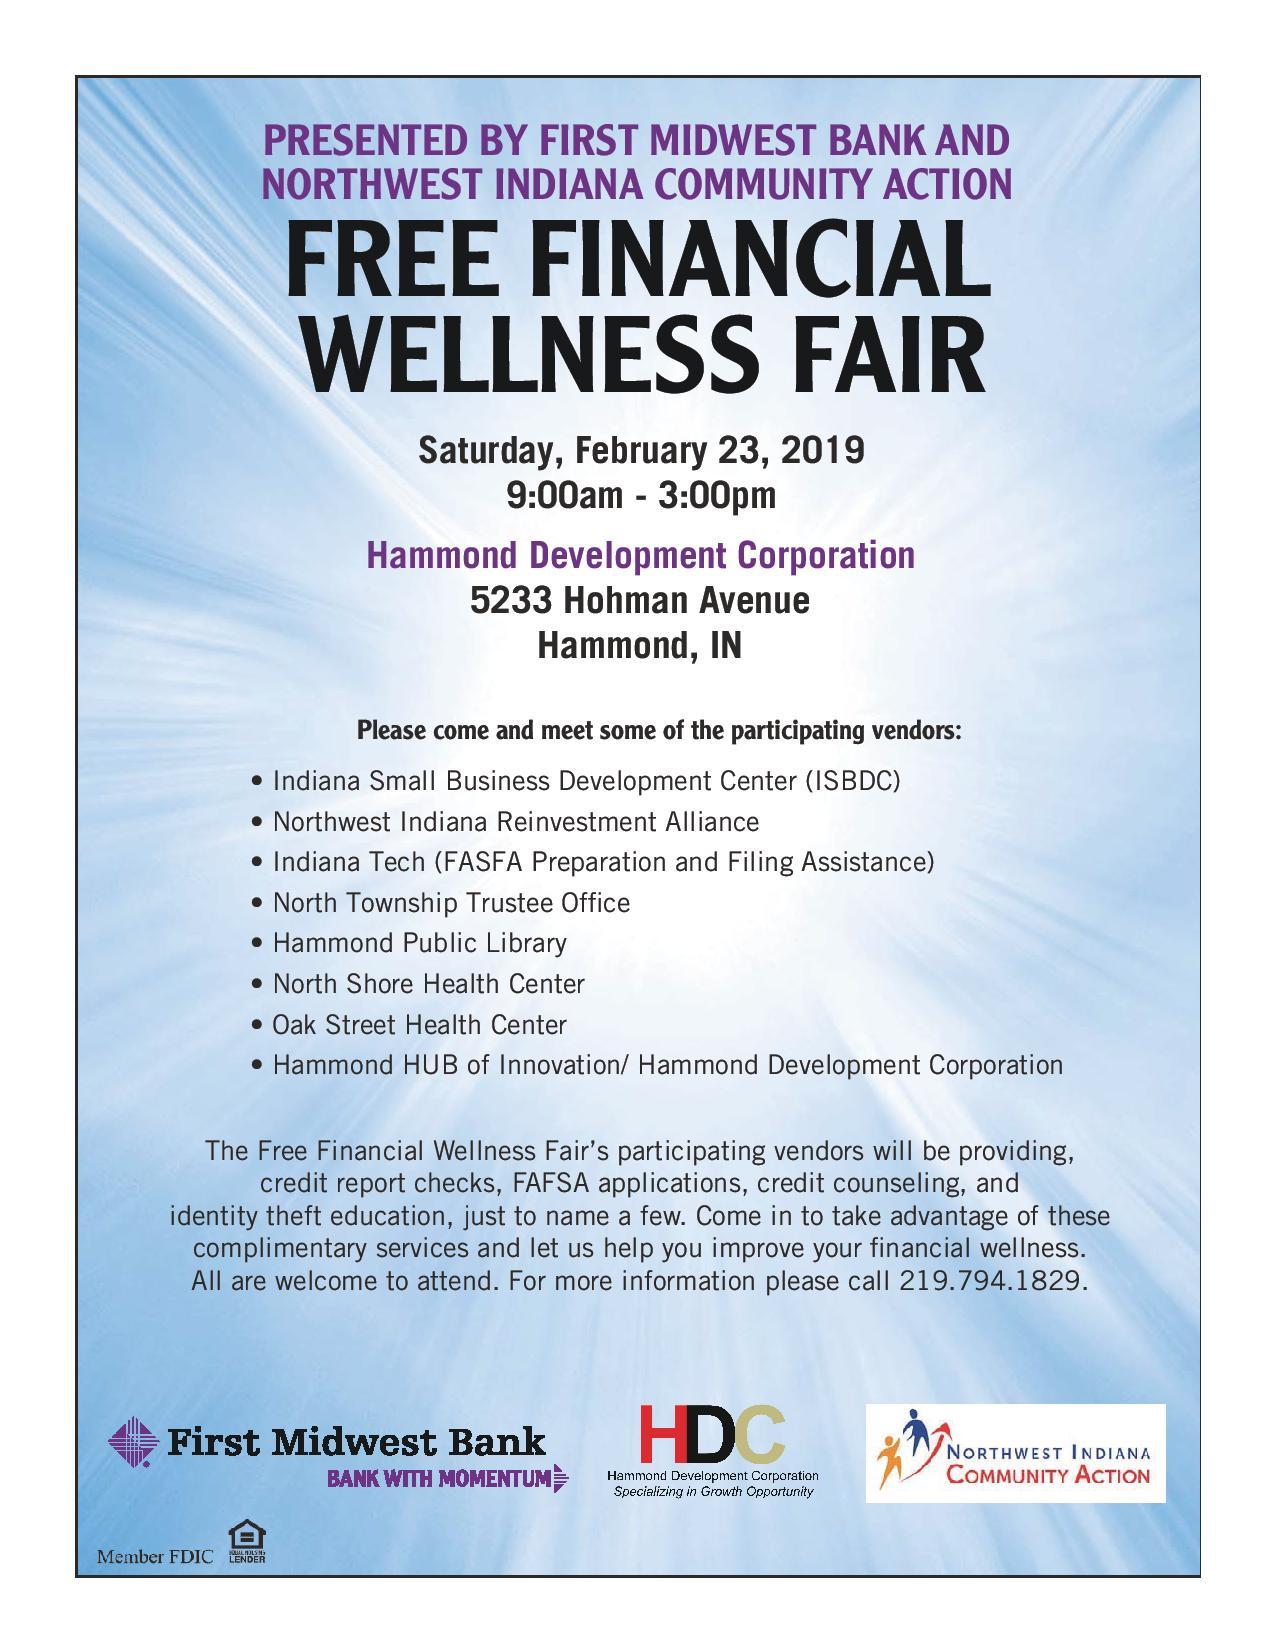 NWICA_Financial Wellness Fair Flyer_02.23.19_revised-011419 (1)-page-001.jpg